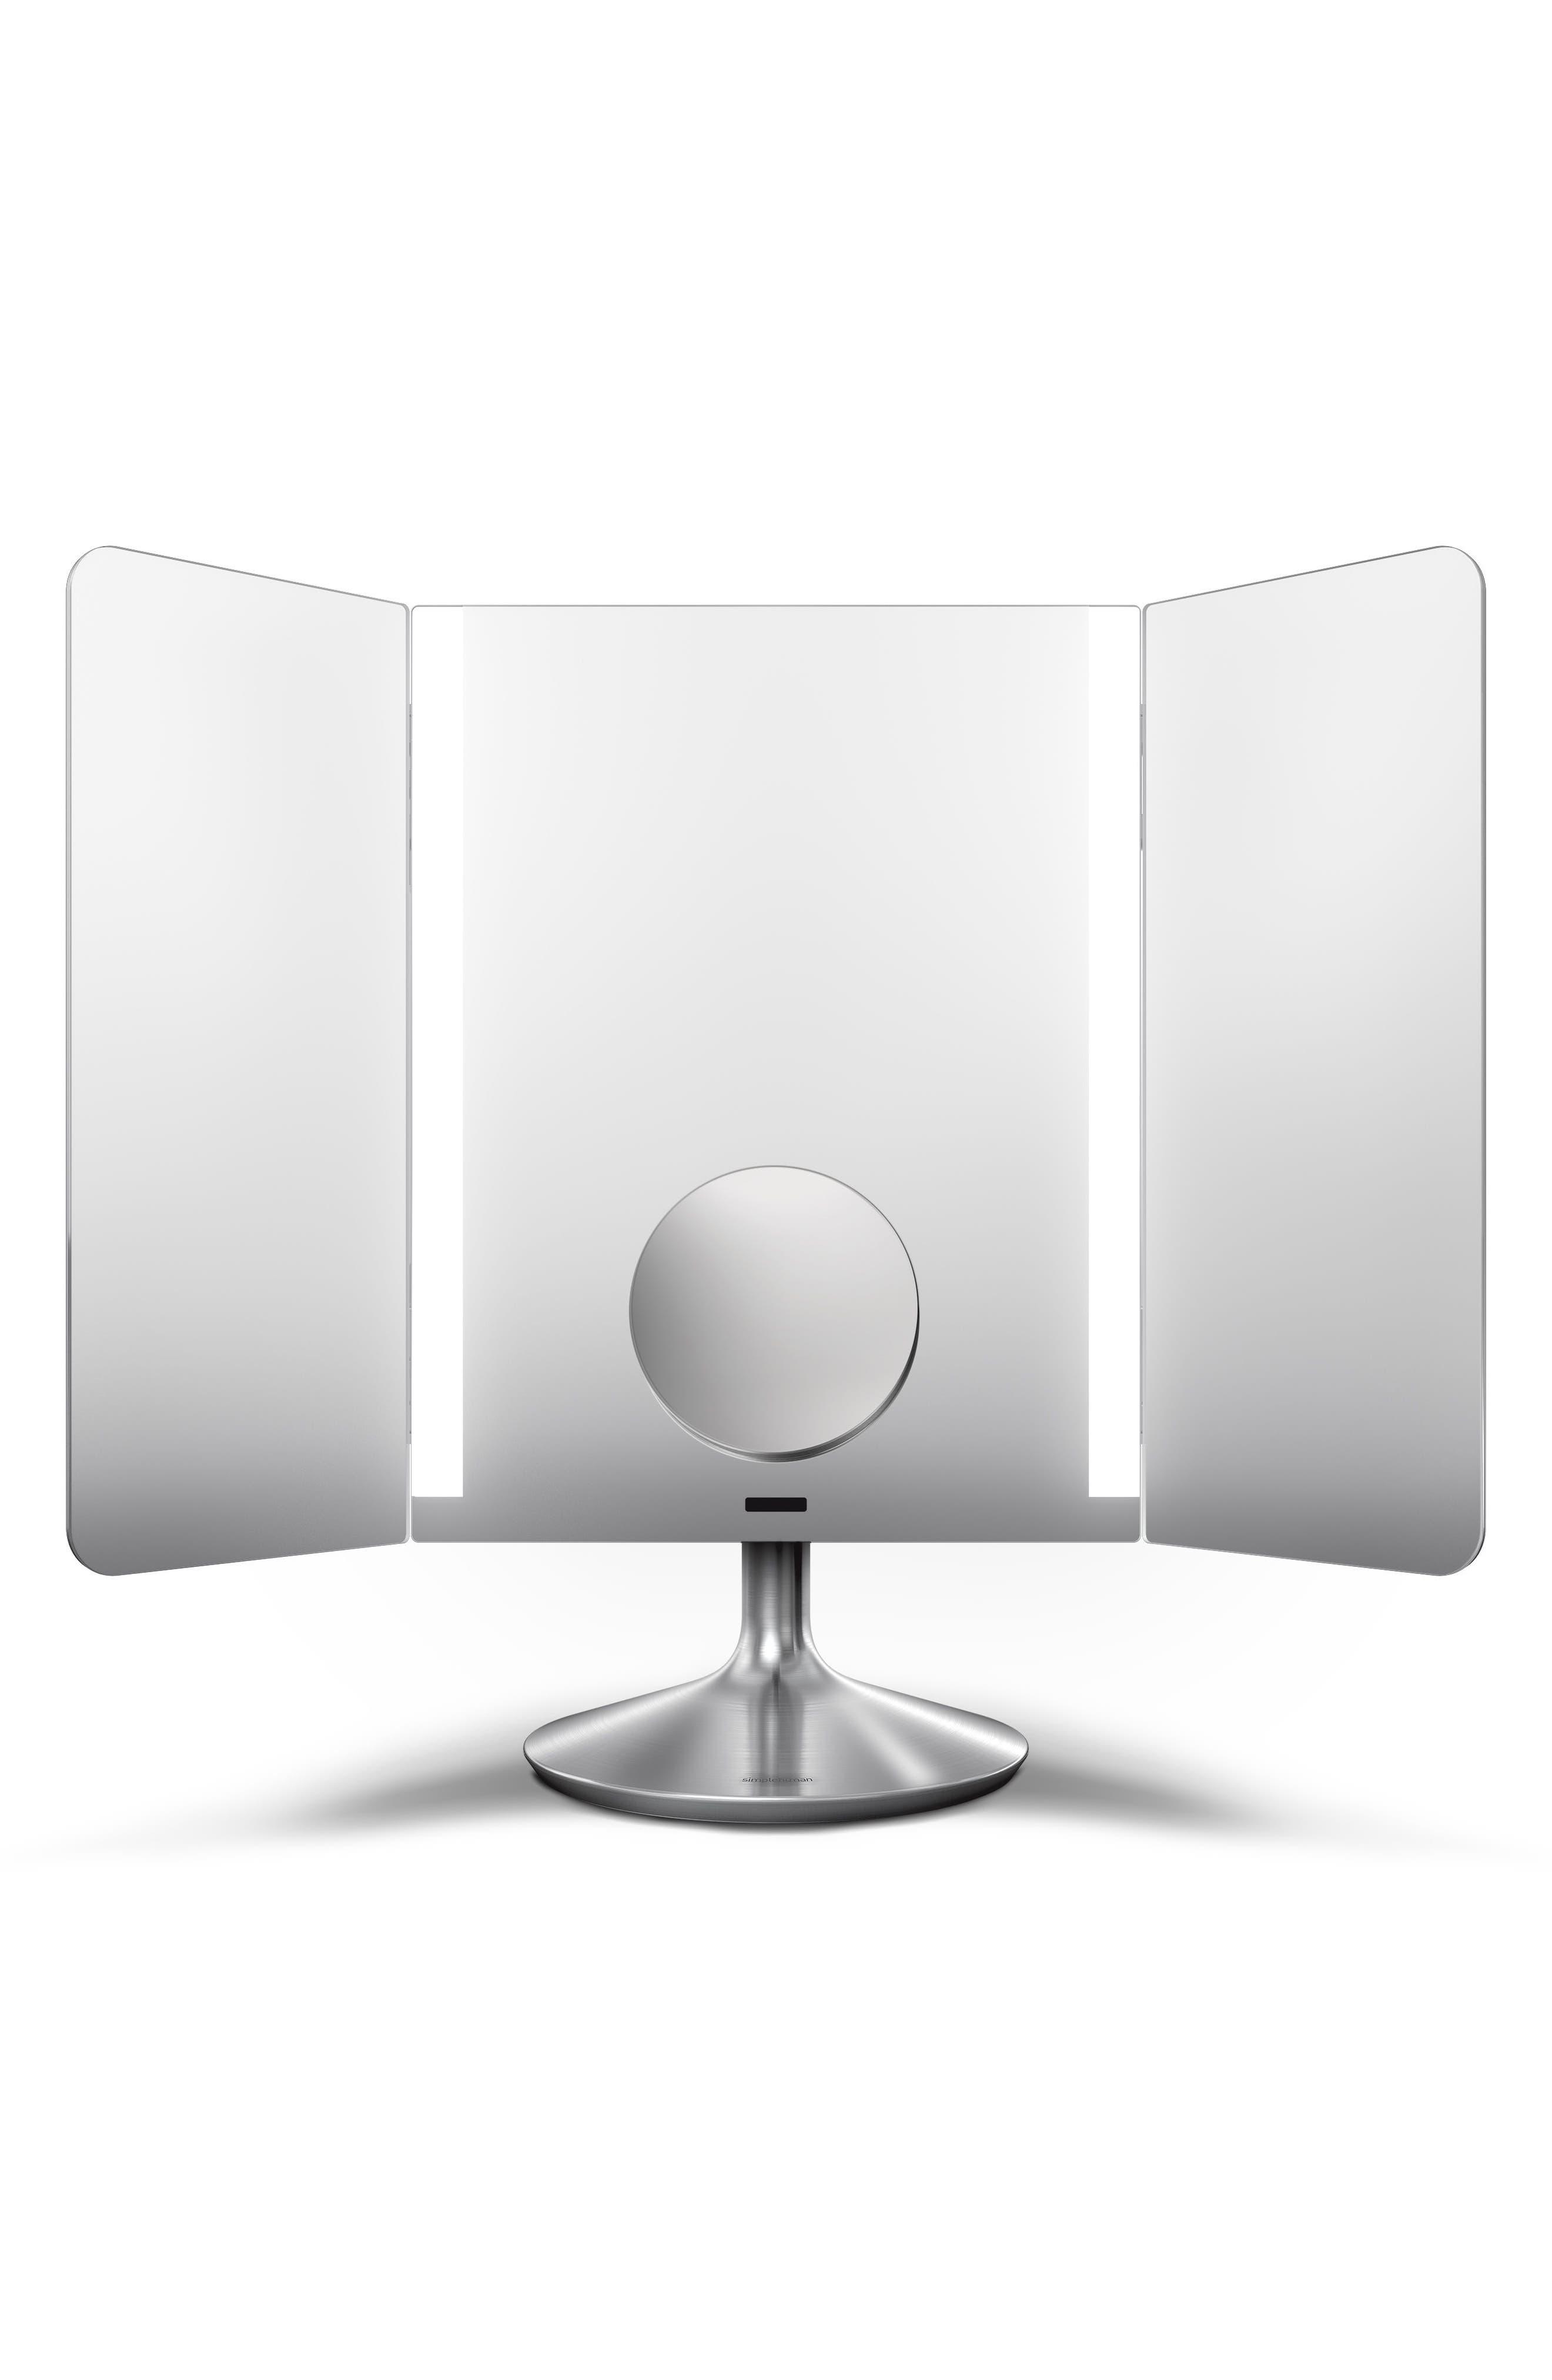 Sensor Mirror Pro Wide View,                             Alternate thumbnail 3, color,                             No Color